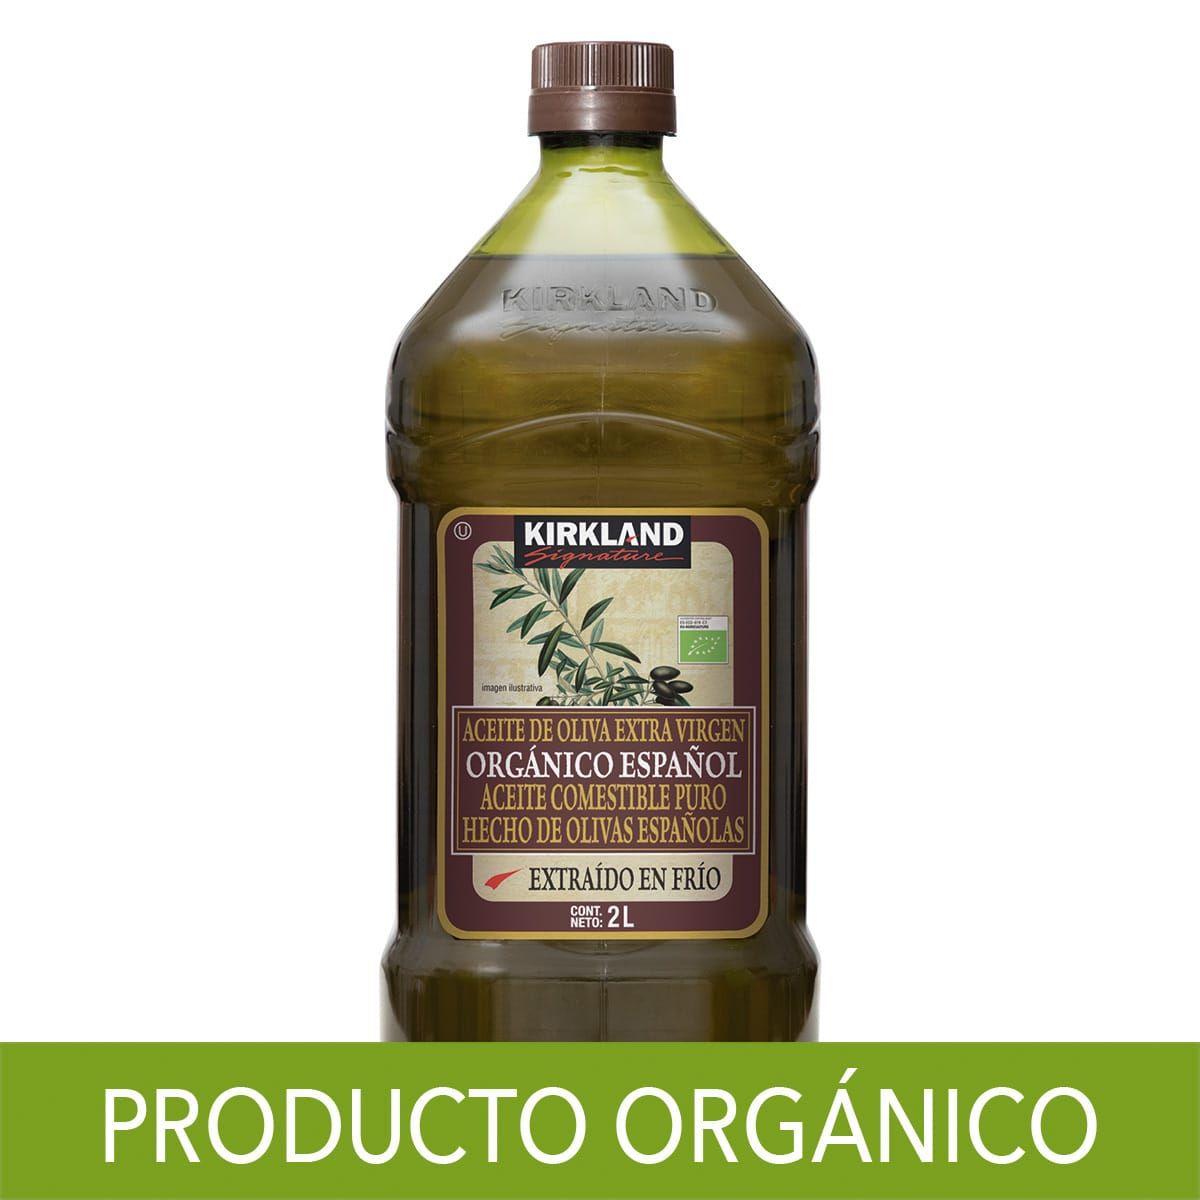 Costco: Kirkland Signature, Aceite de Oliva Orgánico Español 2 litros